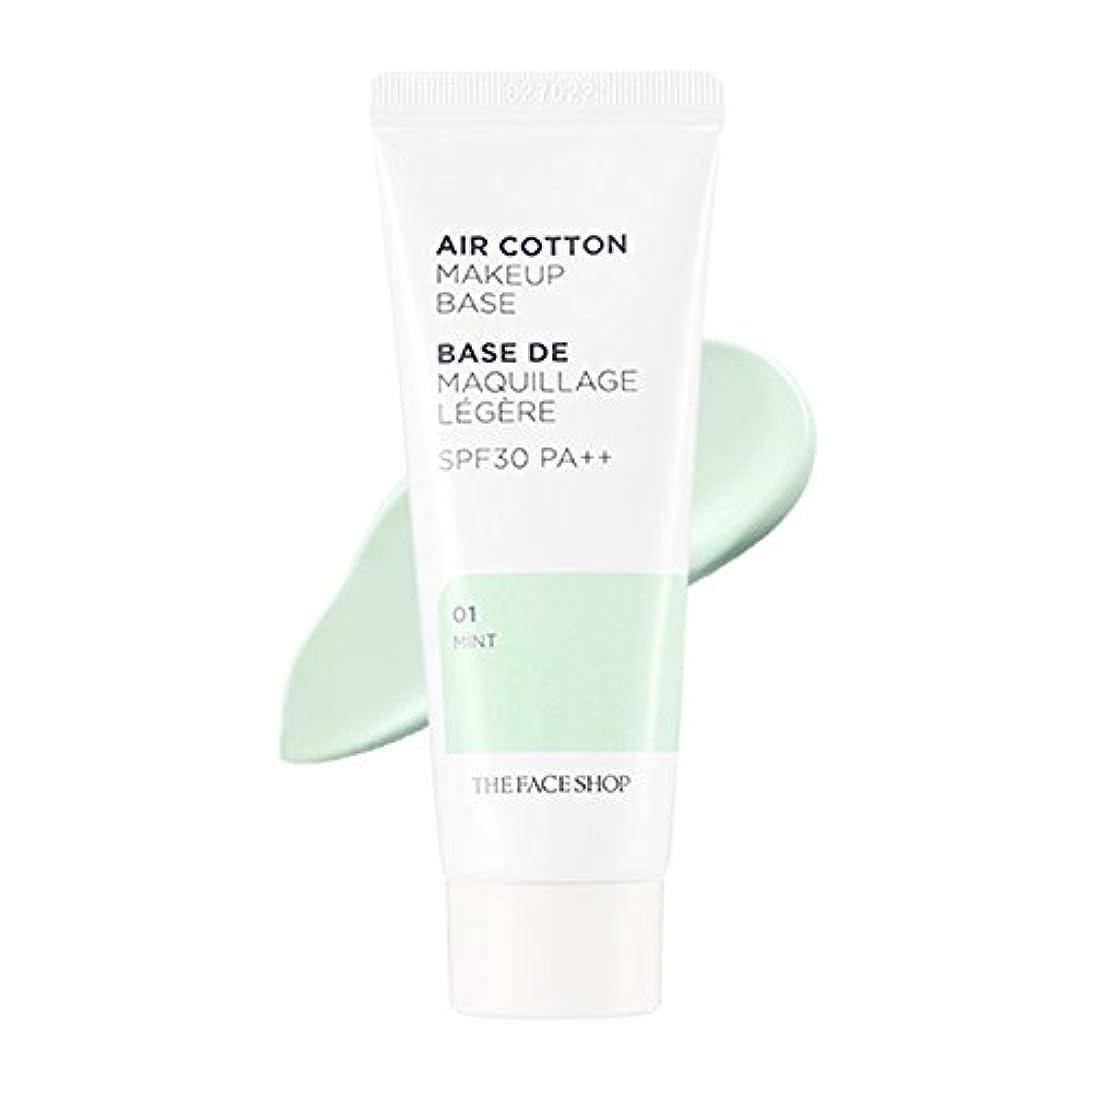 醸造所配偶者君主制The Face Shop Air Cotton Make Up Base SPF30/PA++ 40ml #1 Mint